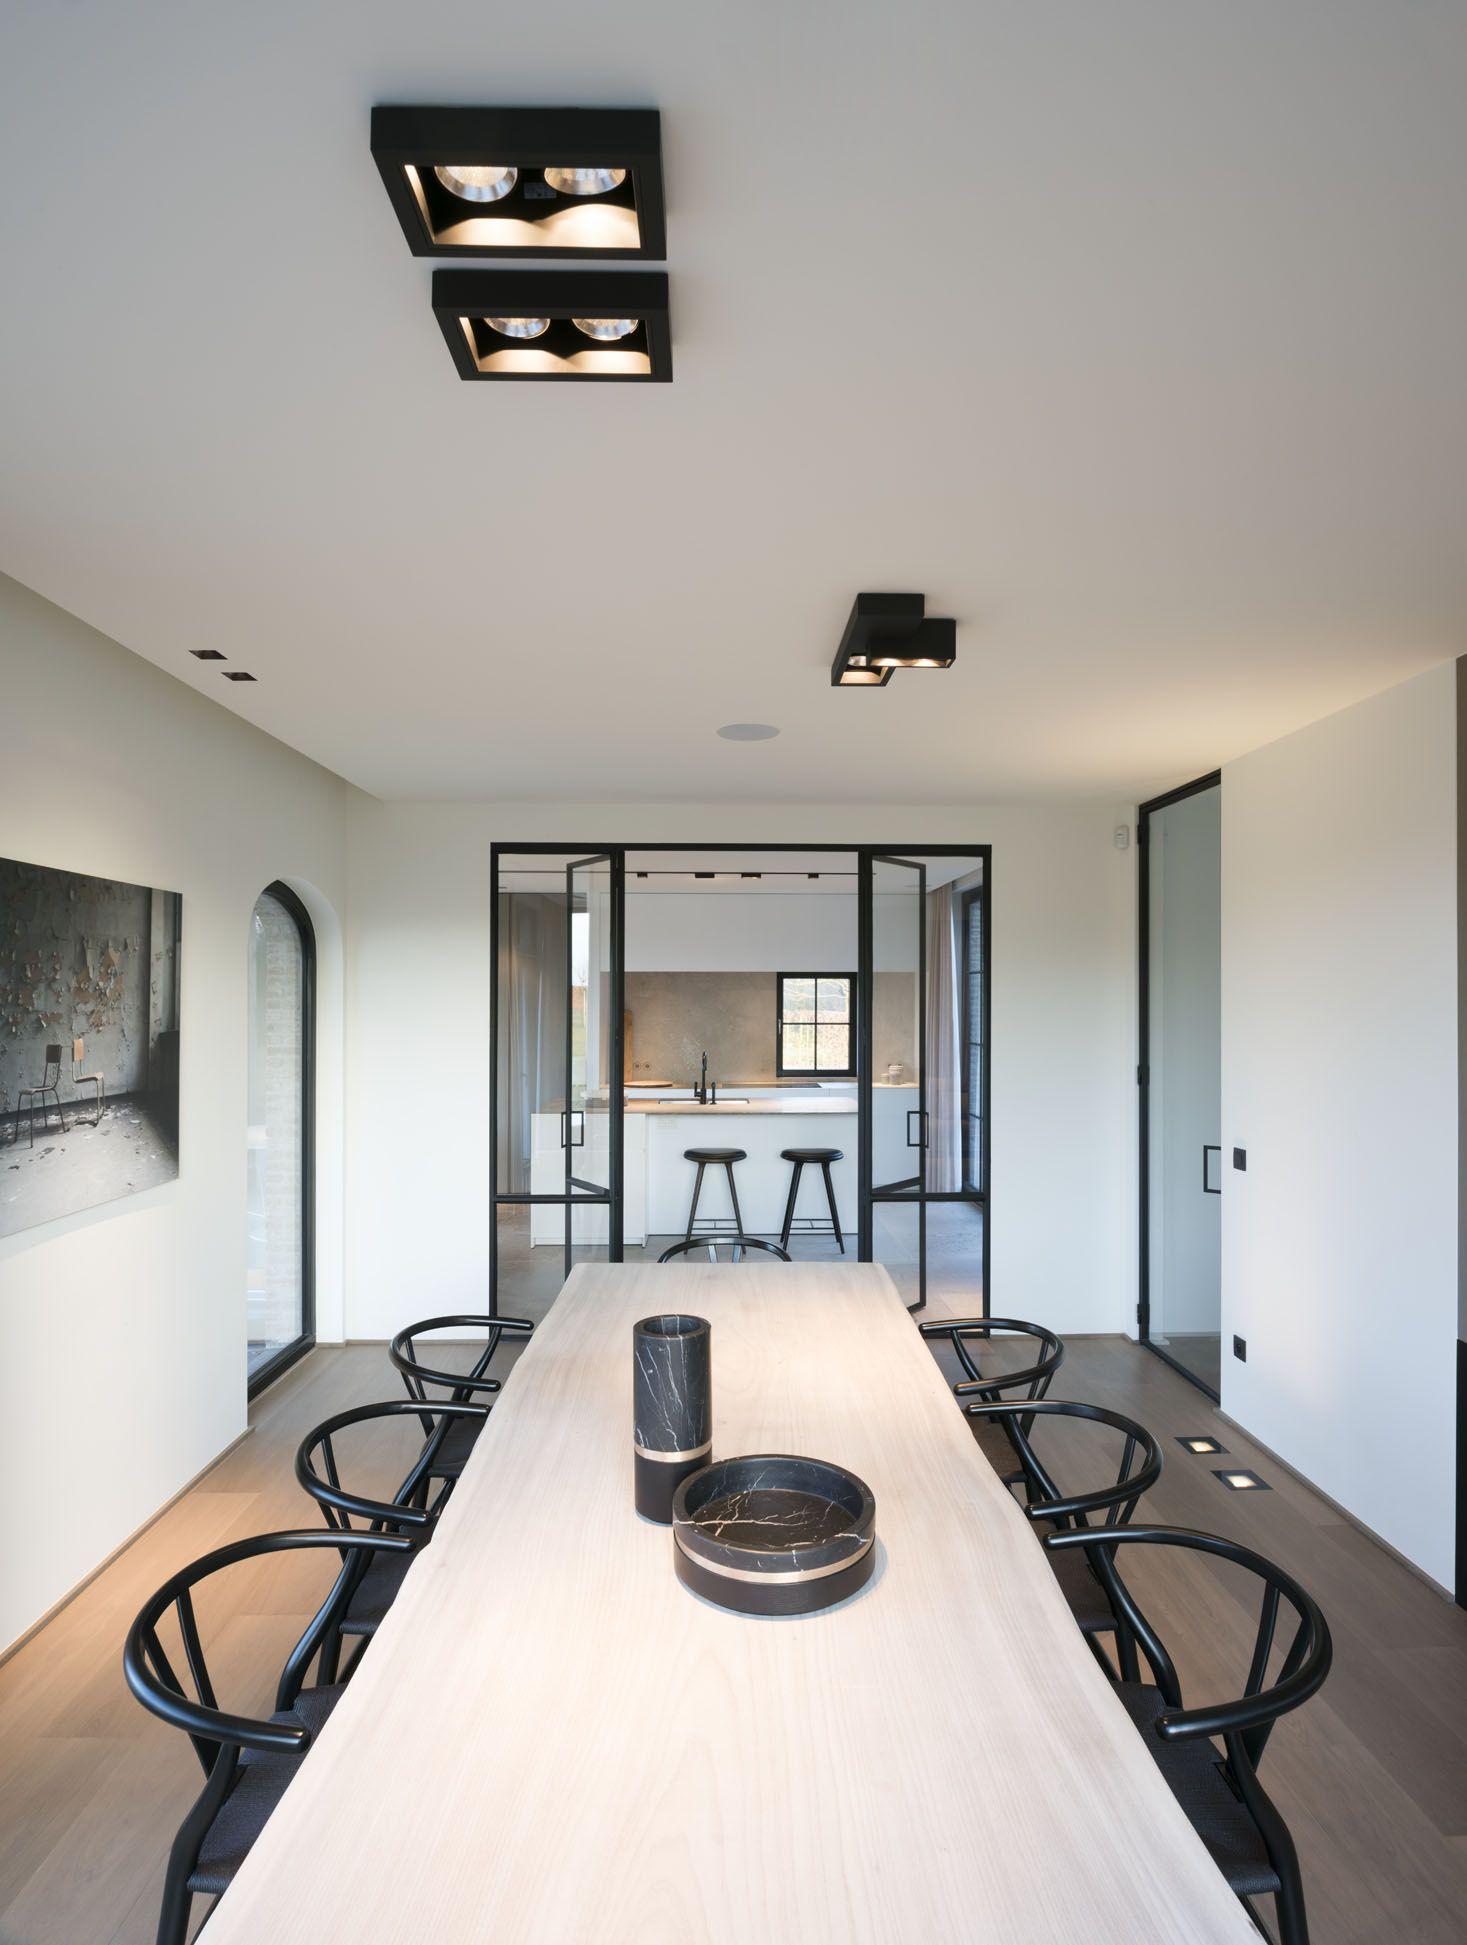 Kreon Lighting Minimalist Modern Led Design Architecture Dining Room Regard